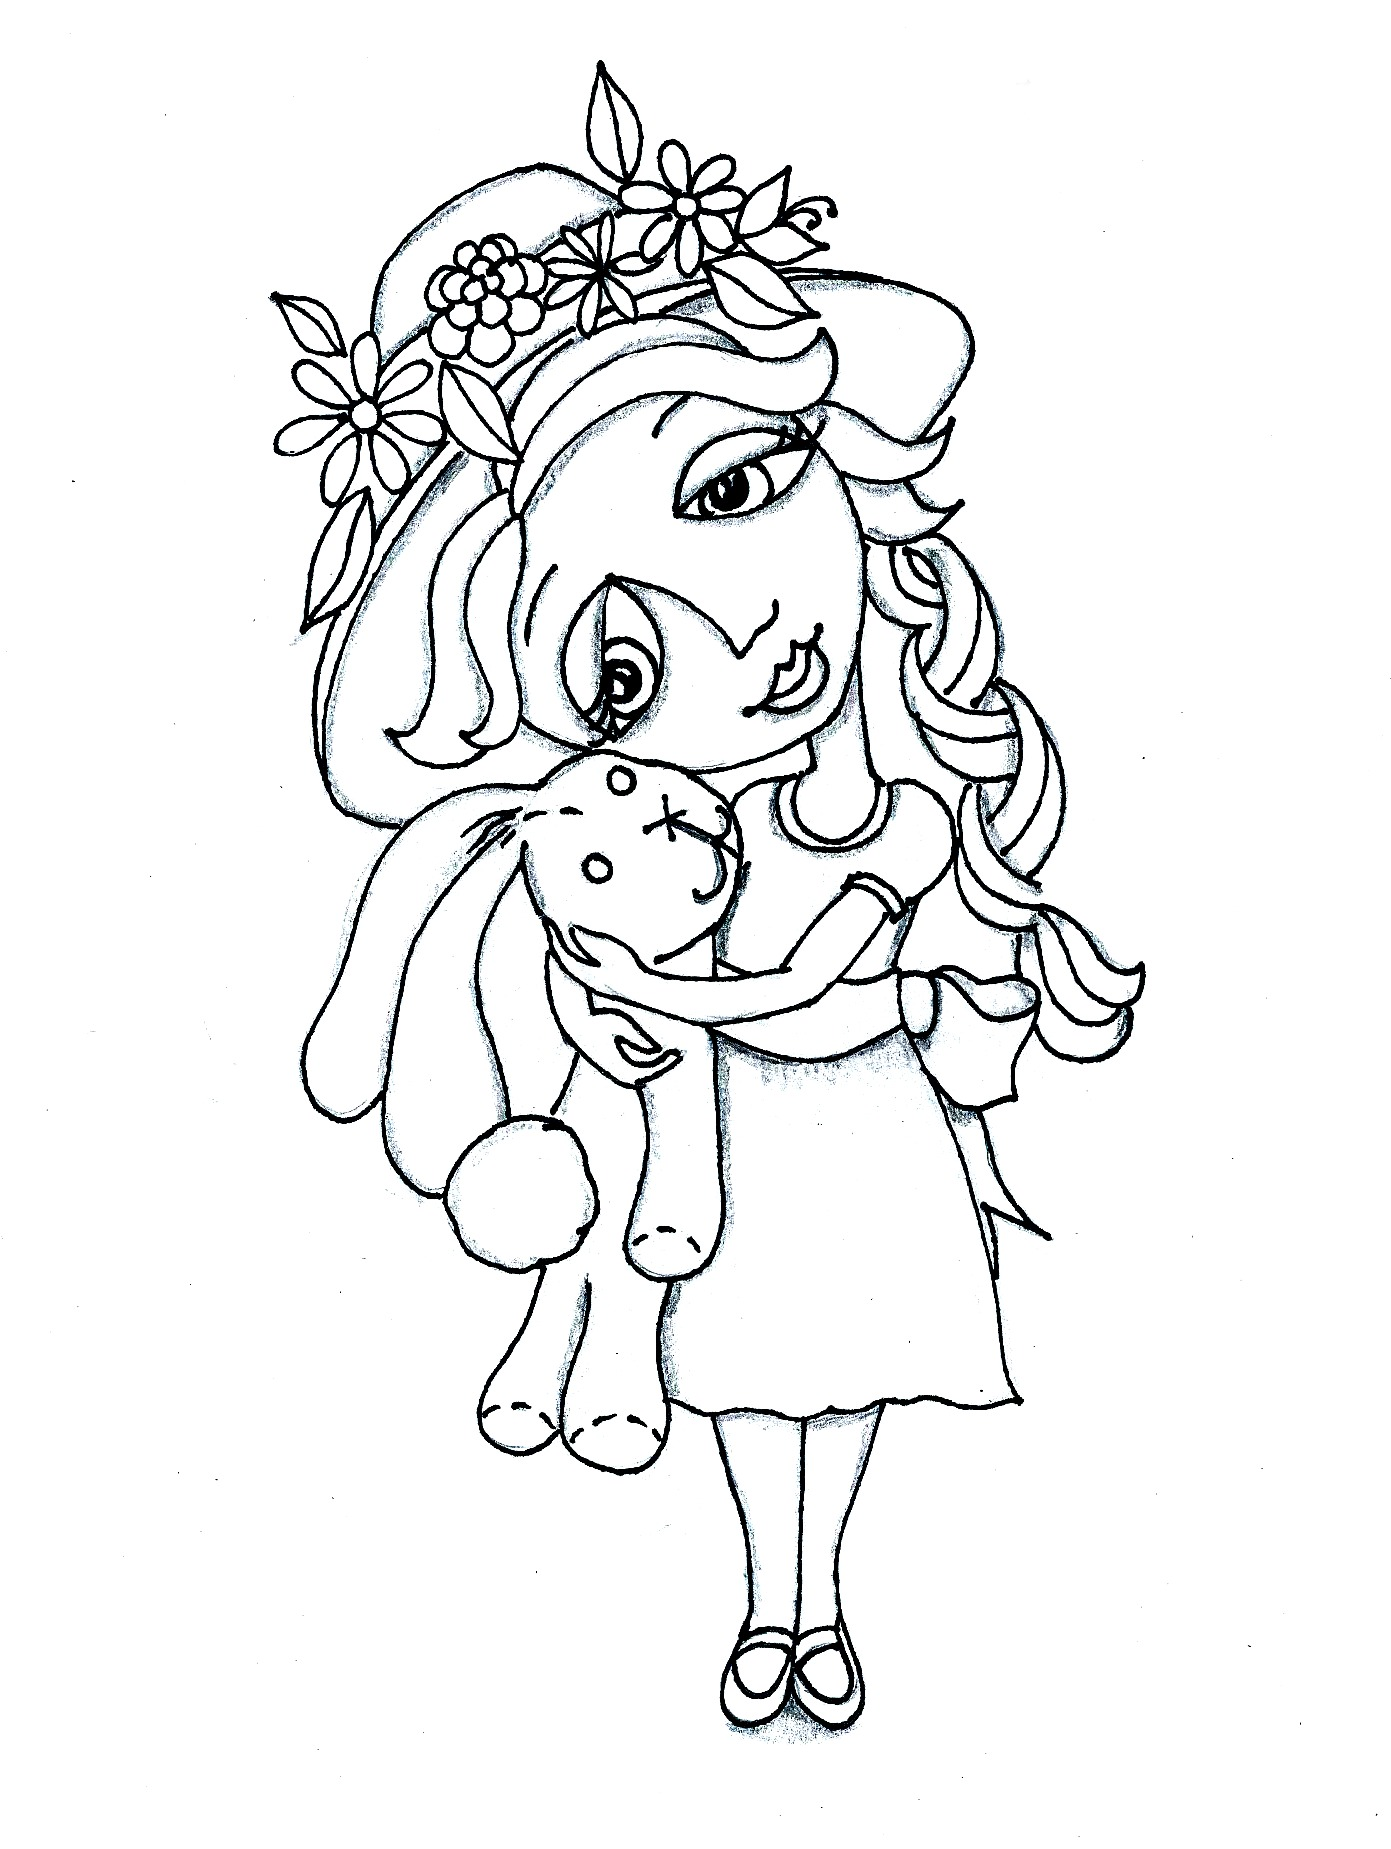 Free coloring pages of leonardo davinci